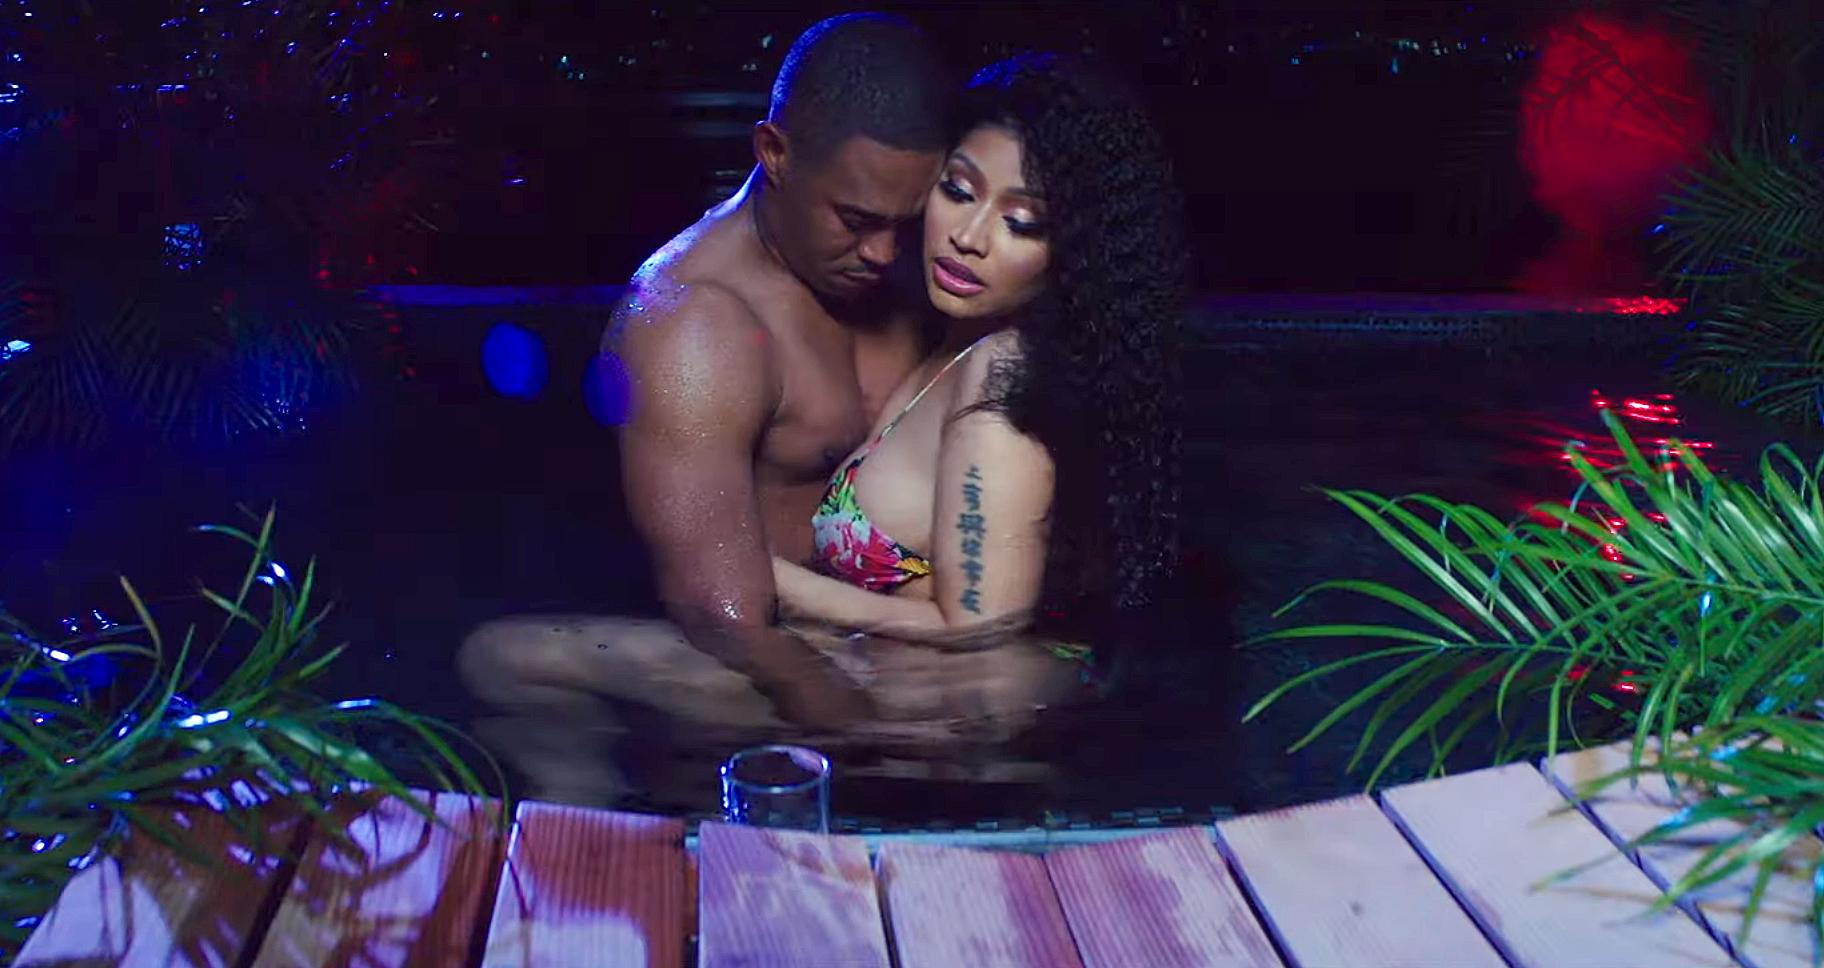 c4da2d1dd448a Nicki Minaj Dances for Boyfriend Kenneth Petty in 'Megatron' Music Video